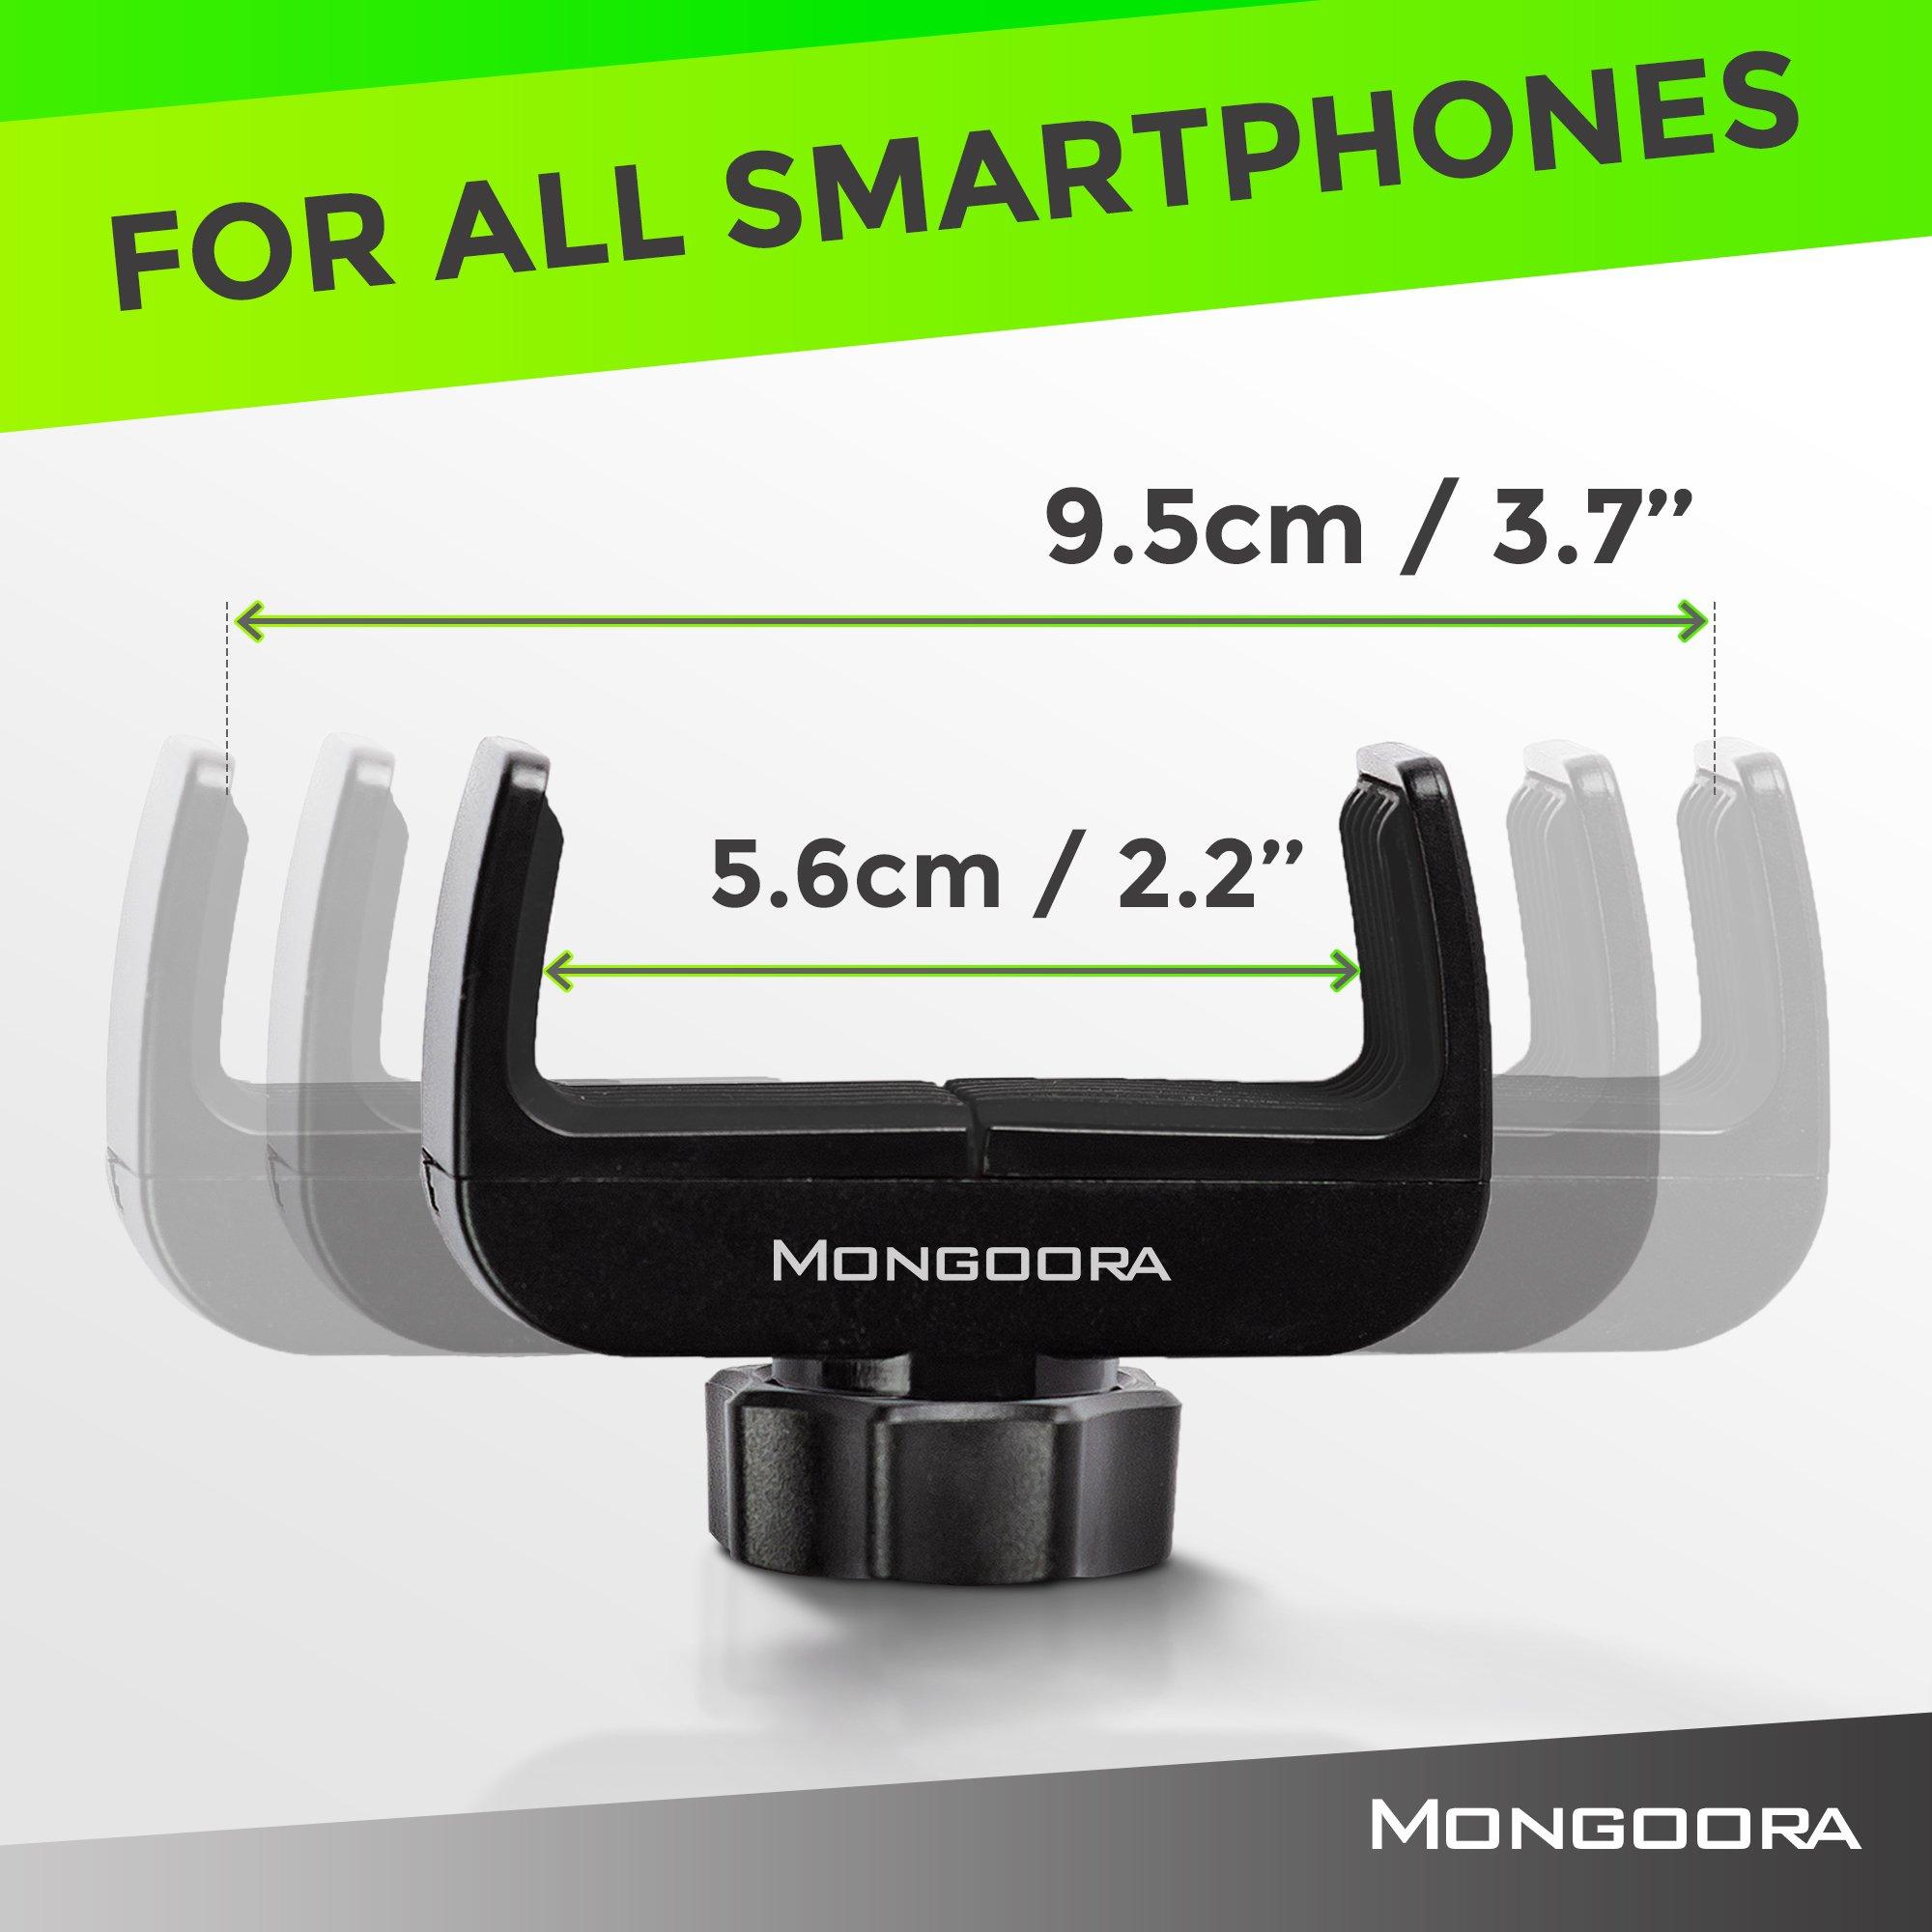 Bike Phone Mount for any Smart Phone: iPhone X 8 7 6 5 plus Samsung Galaxy S9 S8 S7 S7 S6 S5 S4 Edge, Nexus, Nokia, LG. Motorcycle, Bicycle Phone Mount. Mountain Bike Mount. Bike Accessories. by Mongoora (Image #4)